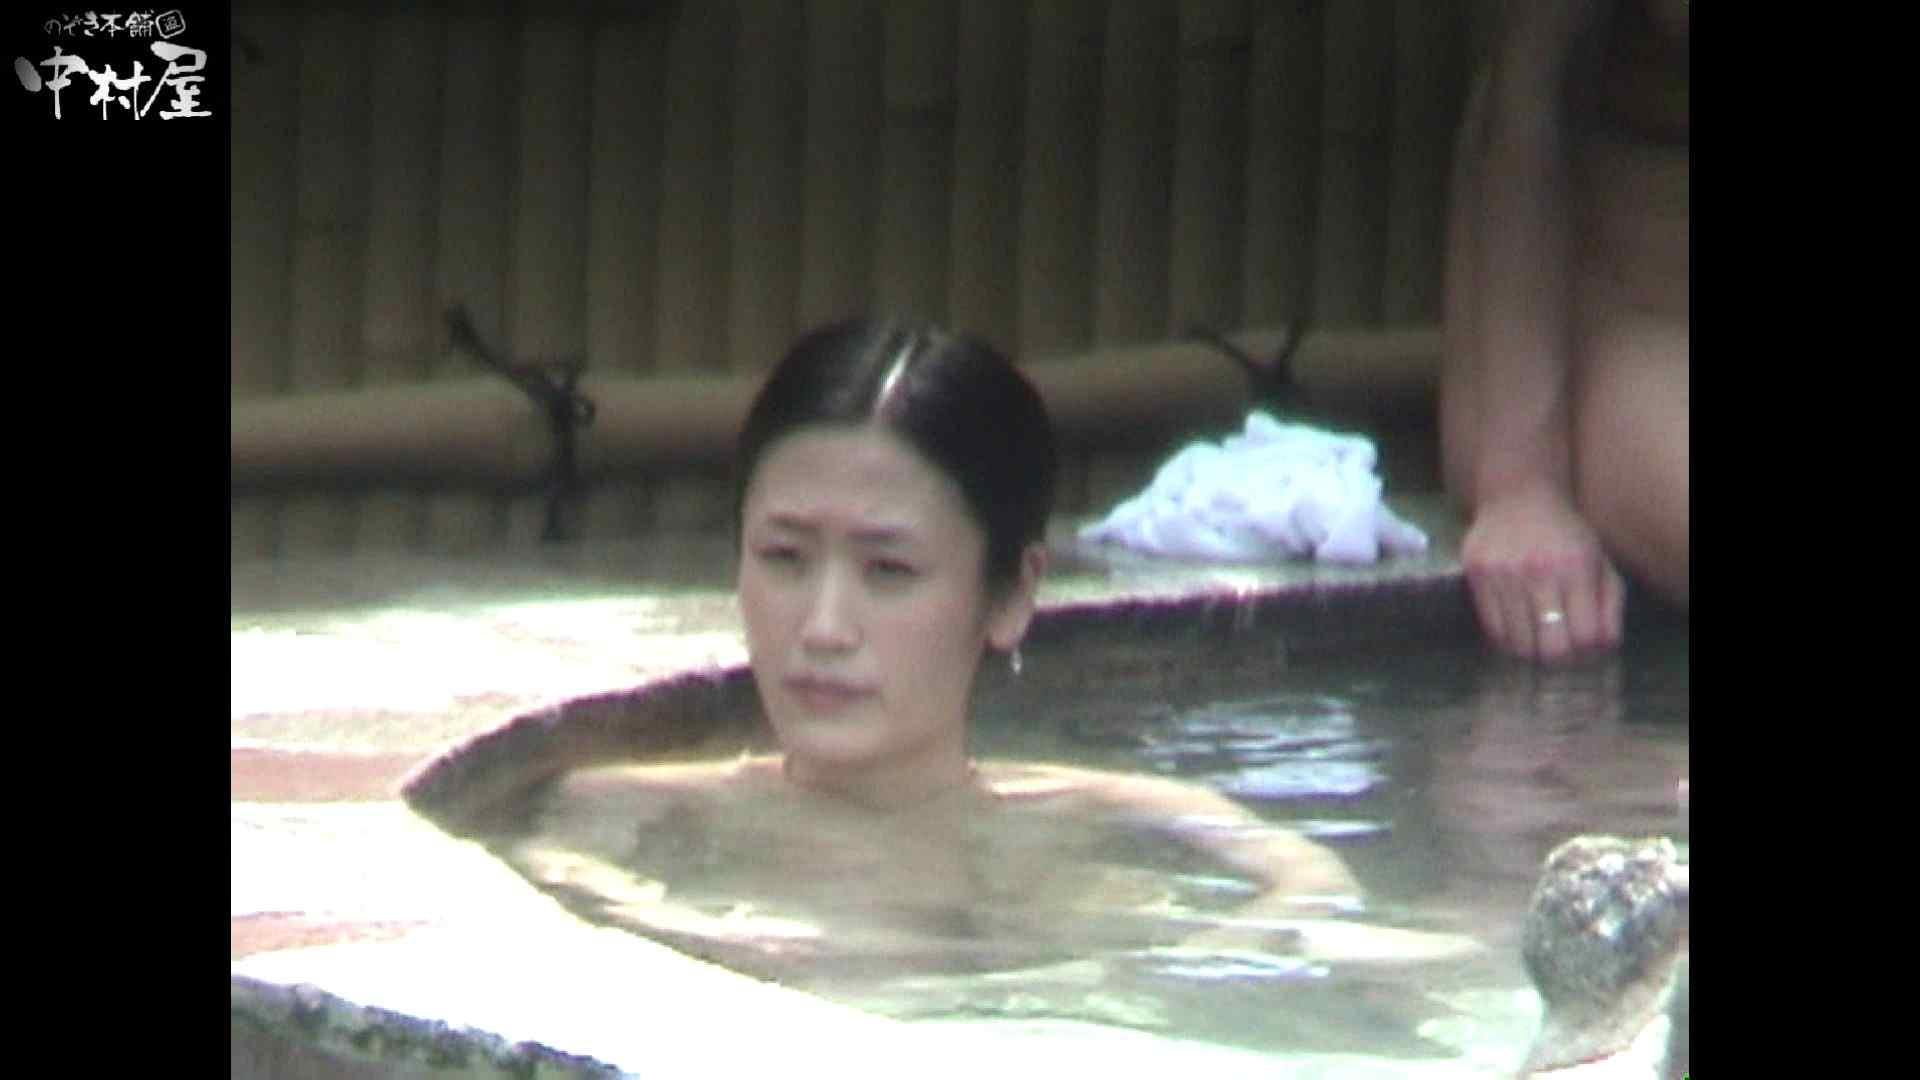 Aquaな露天風呂Vol.934 盗撮シリーズ | 露天風呂編  88PIX 5